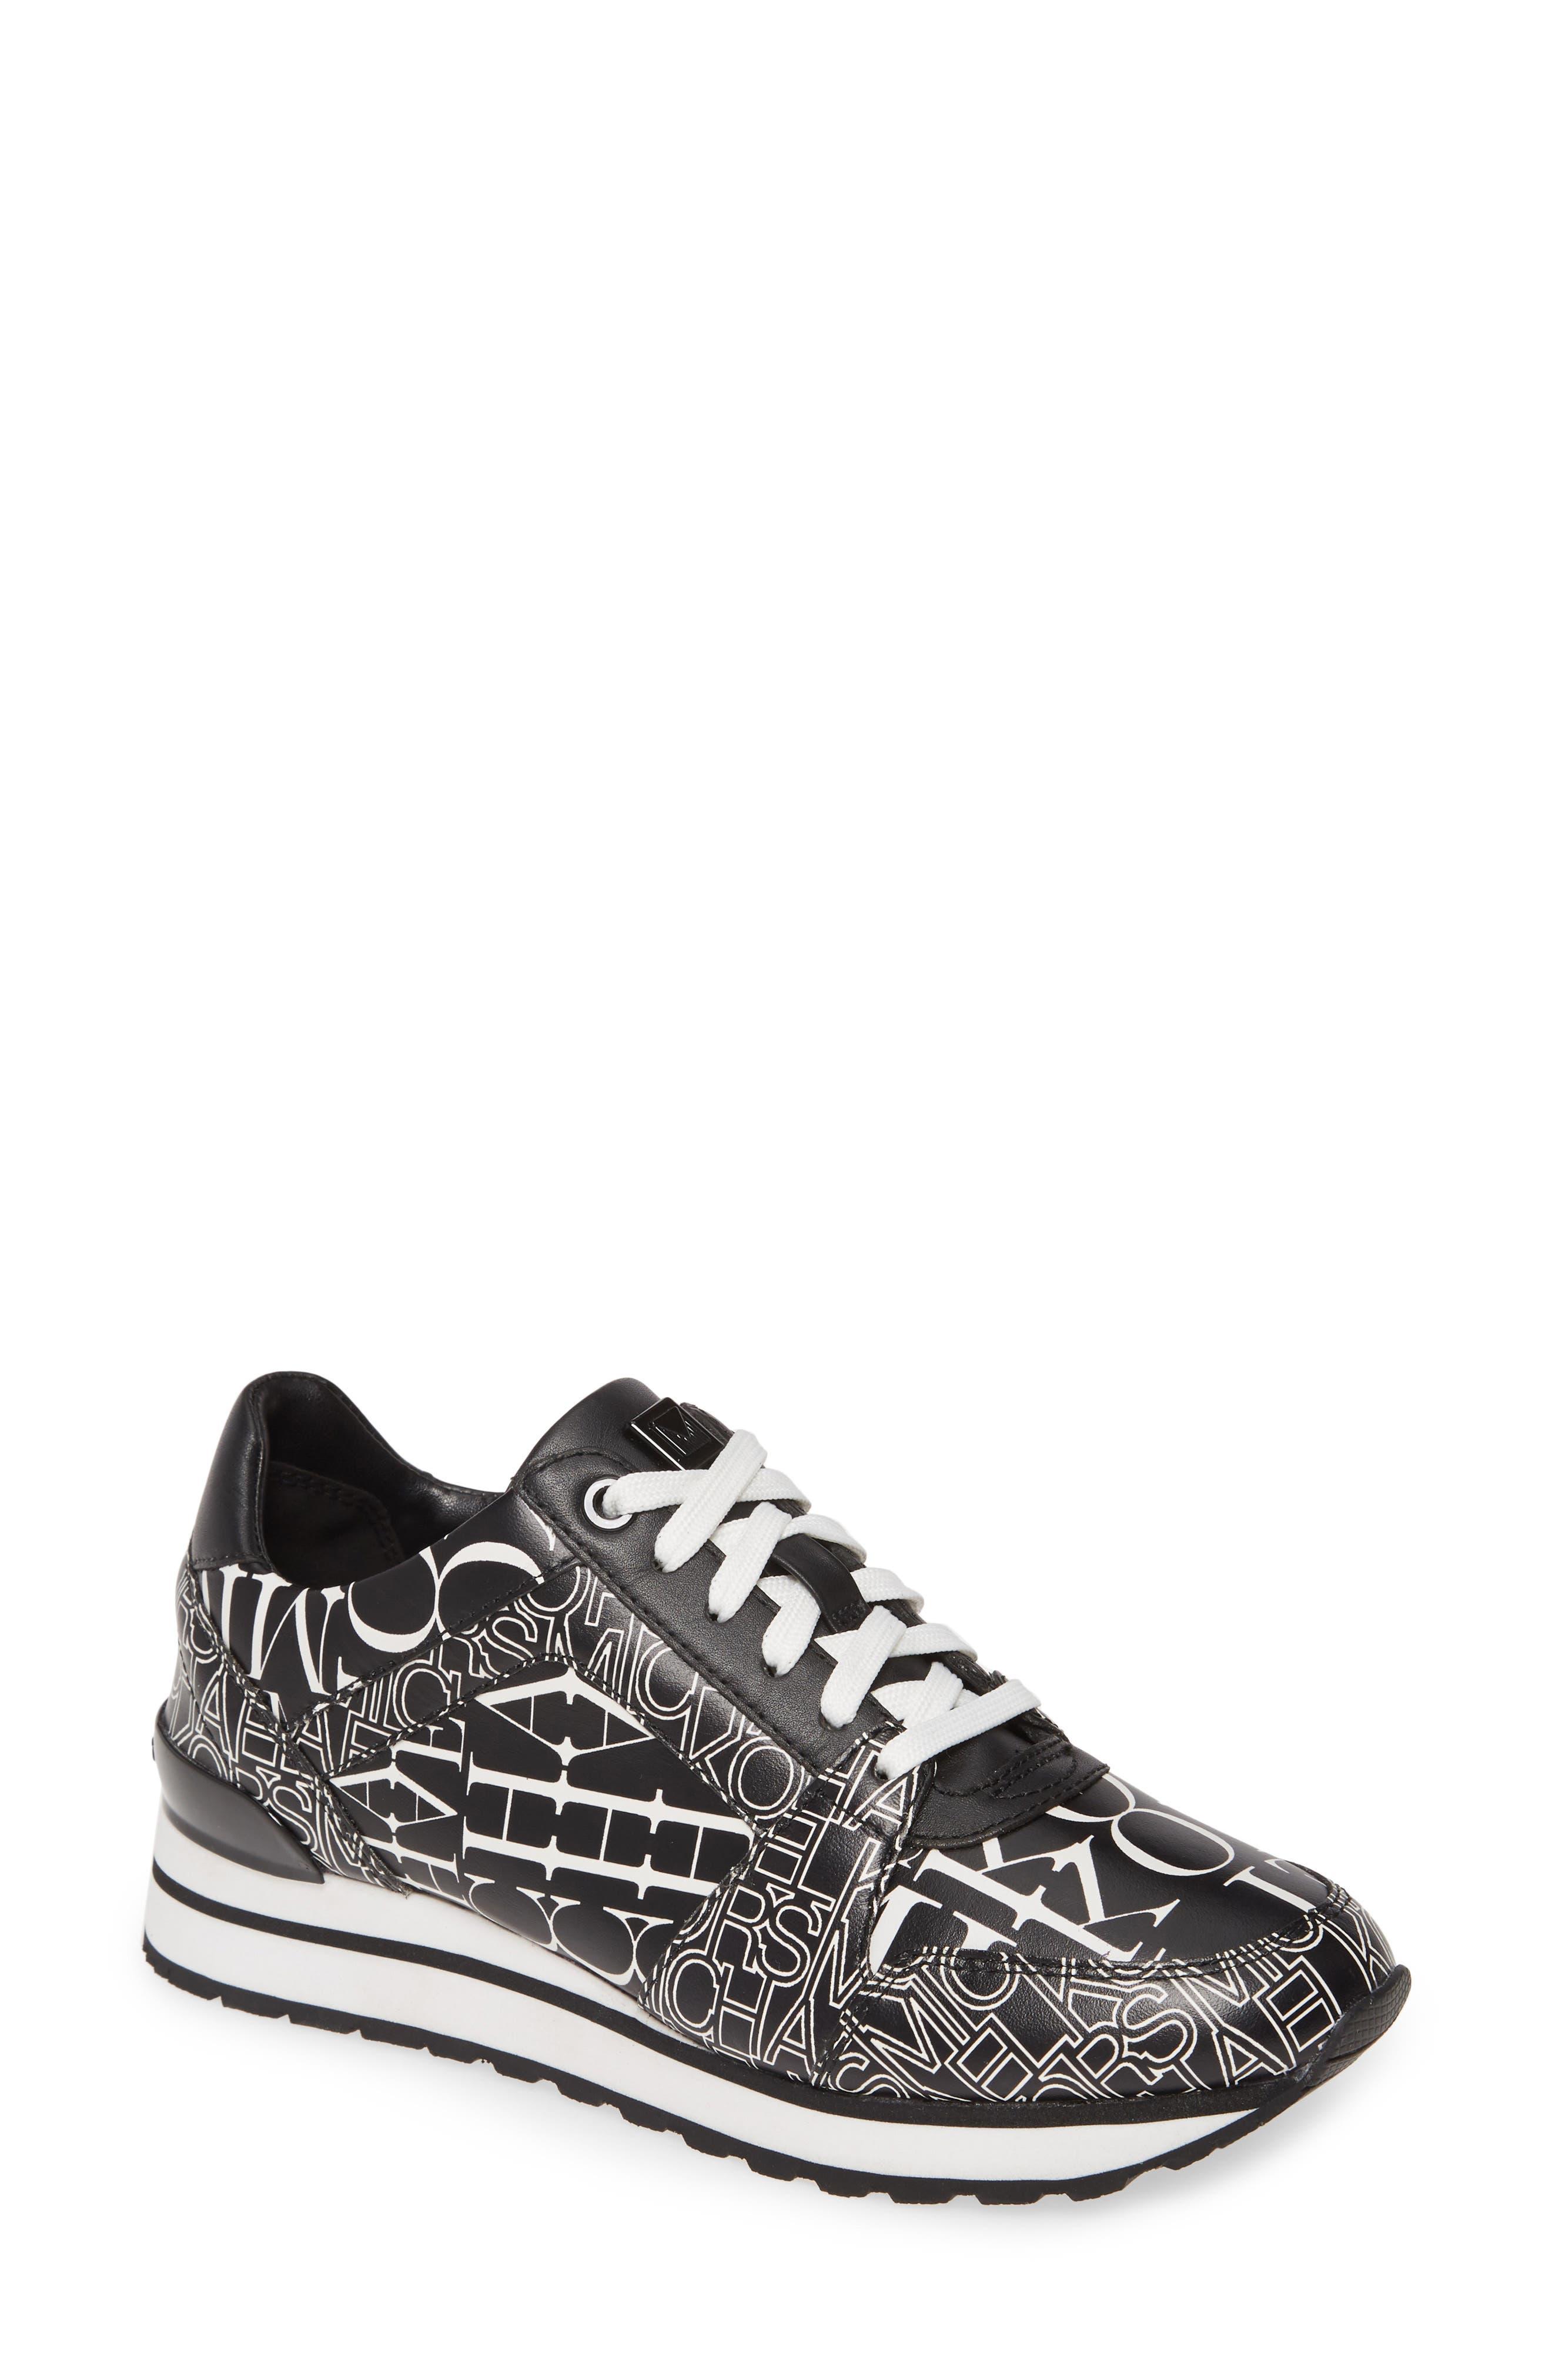 Michael Michael Kors Billie Perforated Sneaker, Black